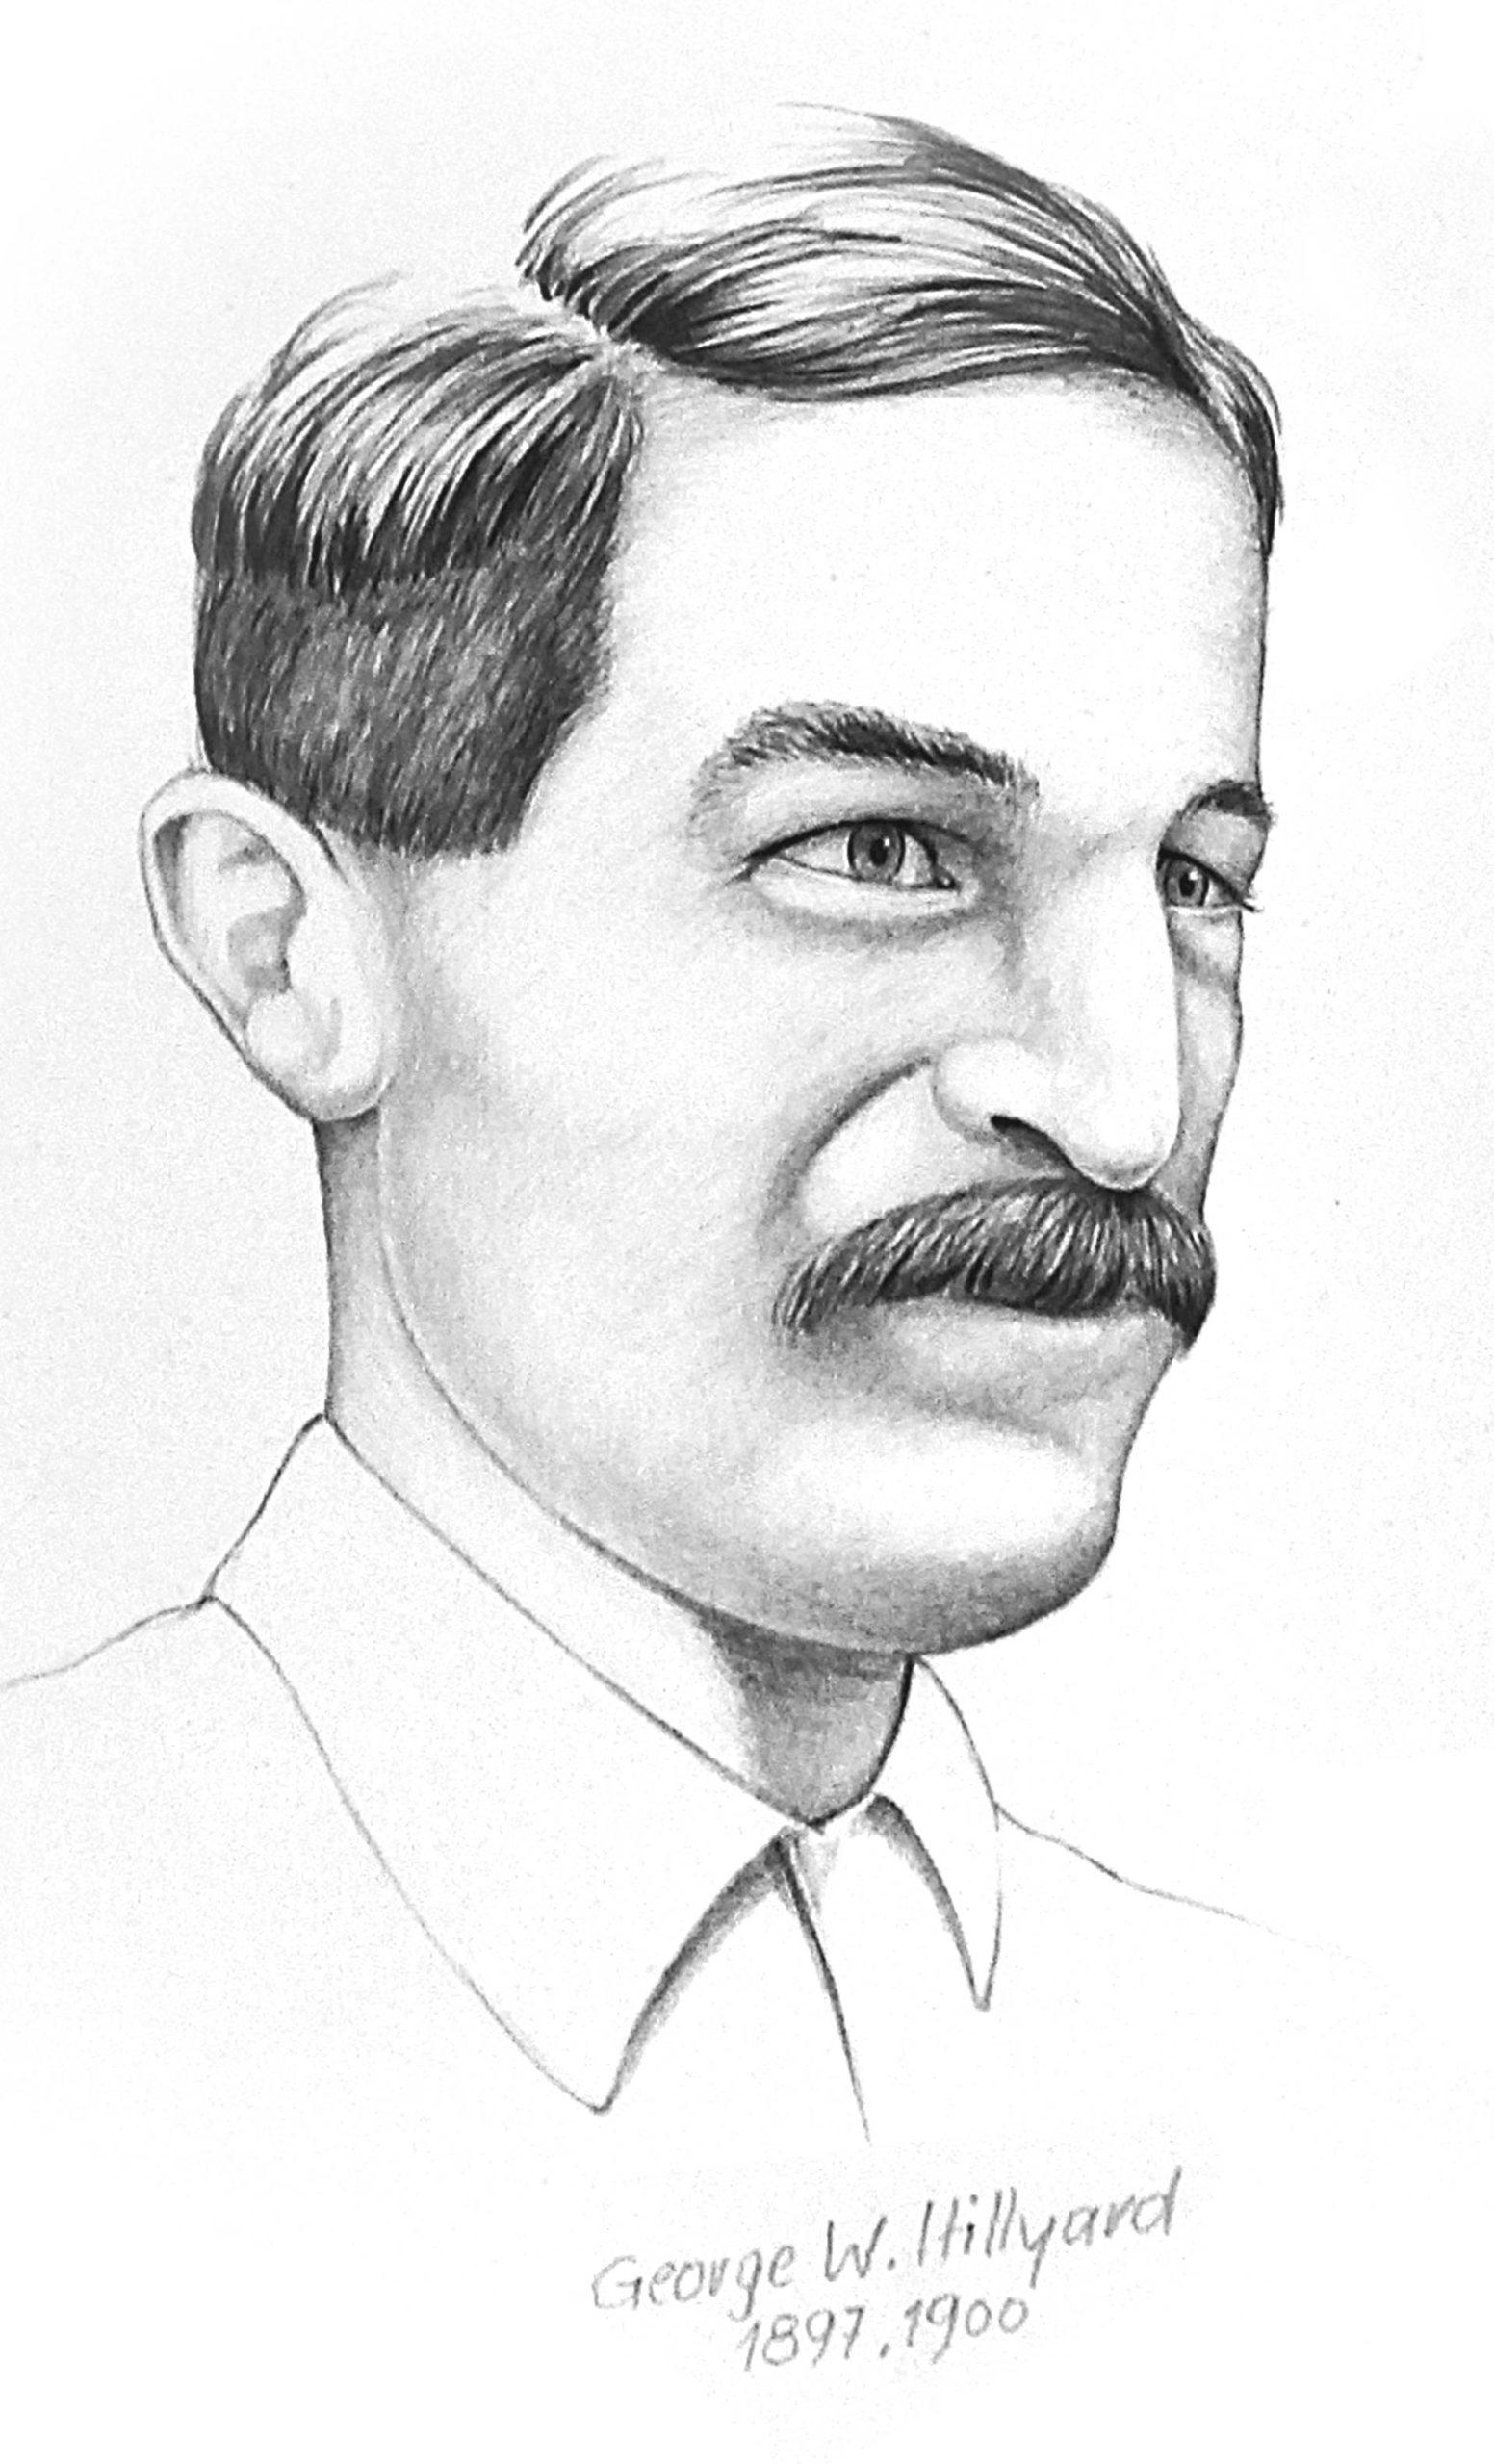 Georg Hillyard